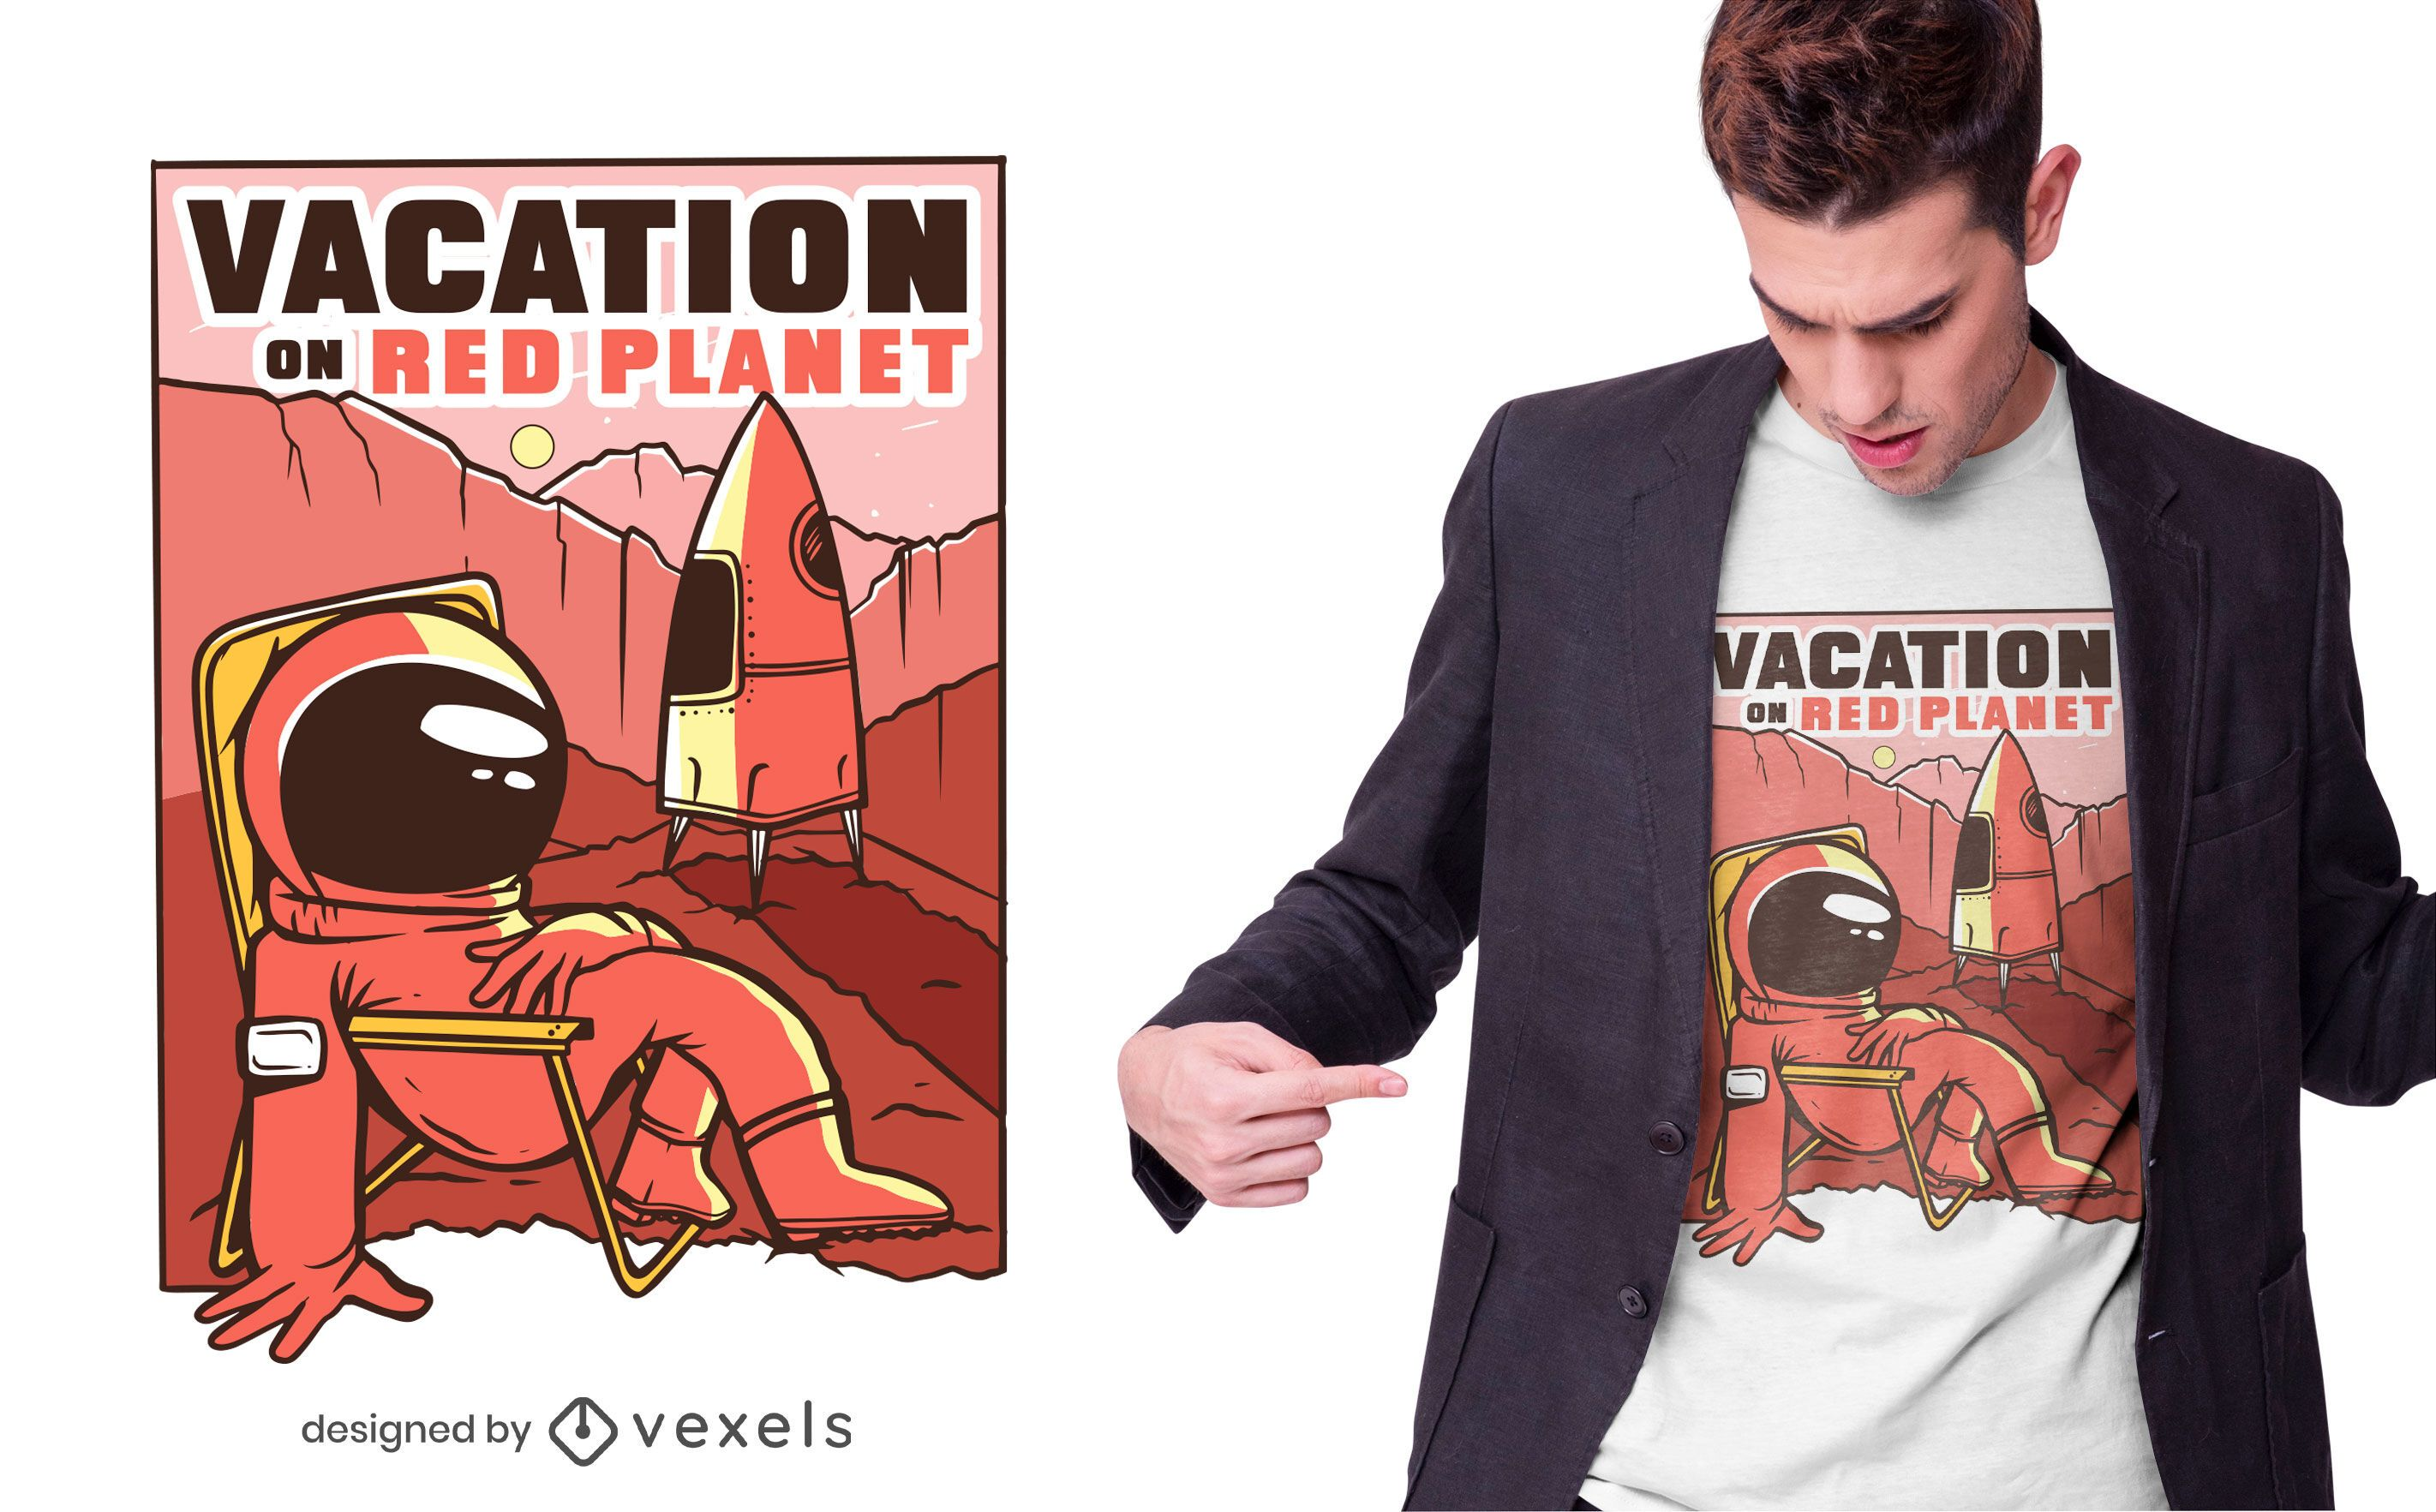 Mars vacations t-shirt design